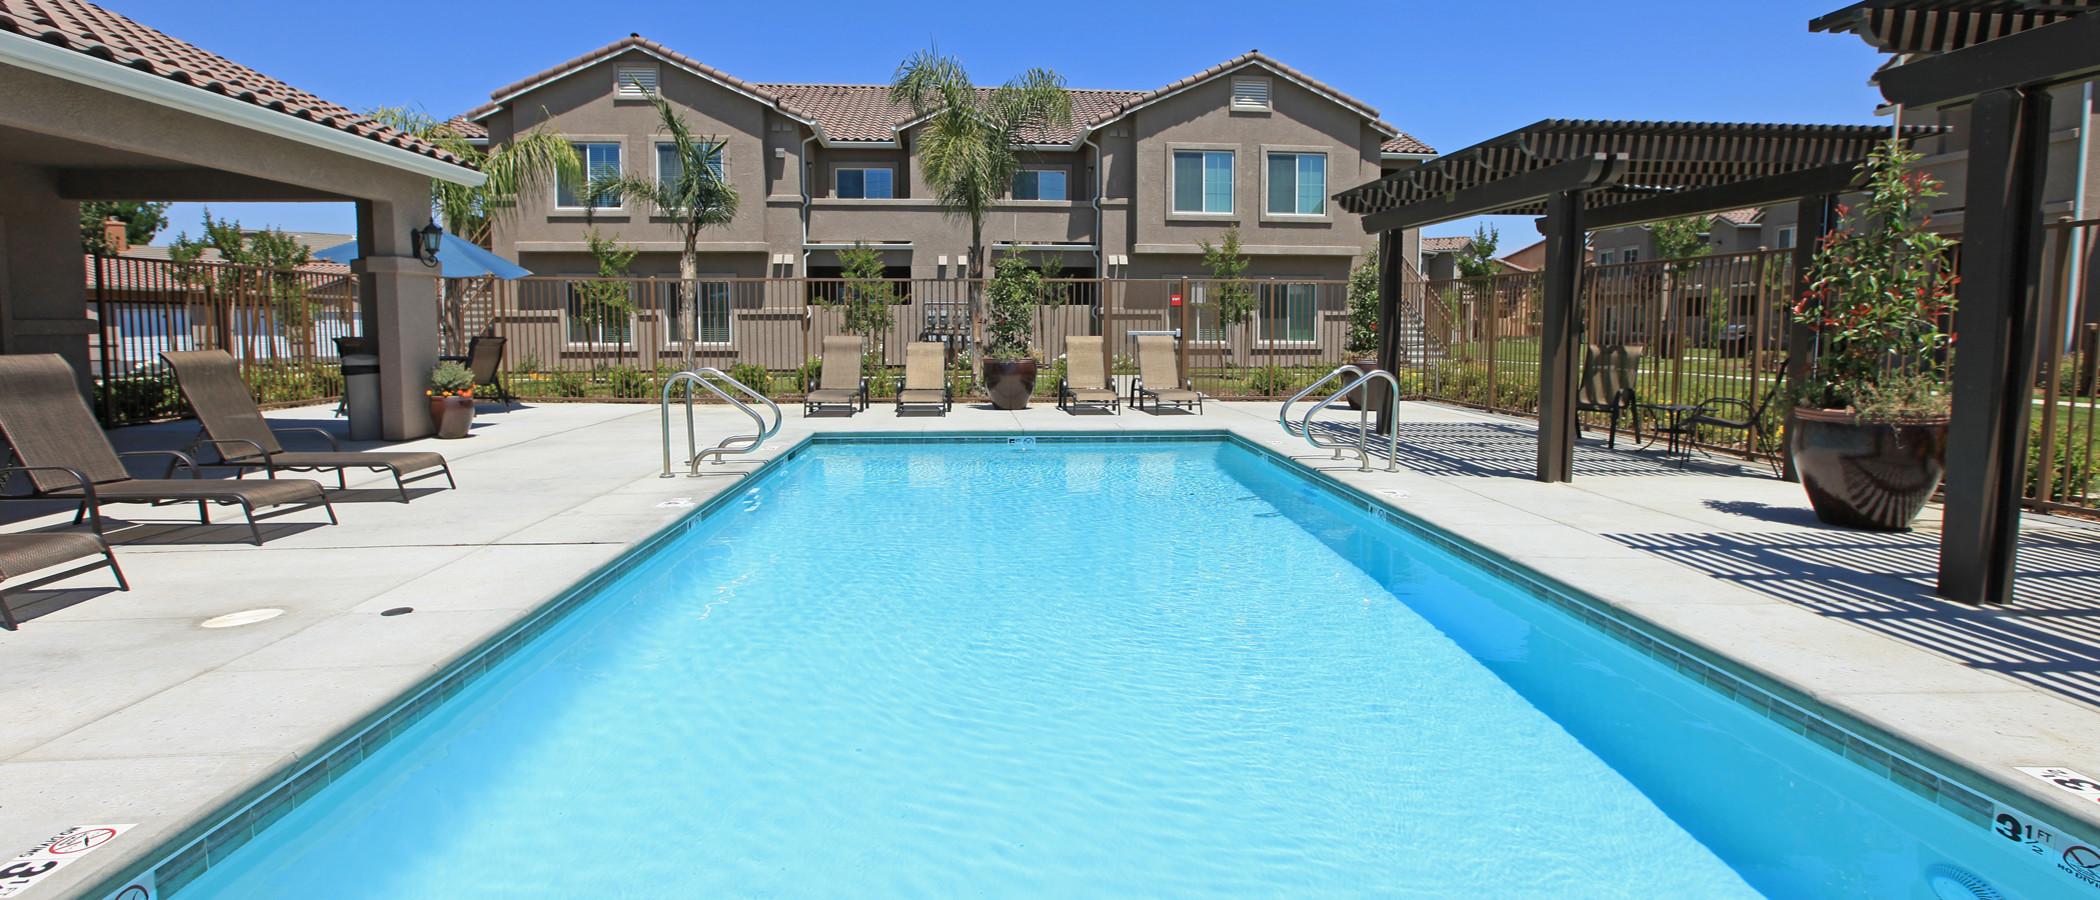 Villa Sa Vini - Apartments in Fresno, CA